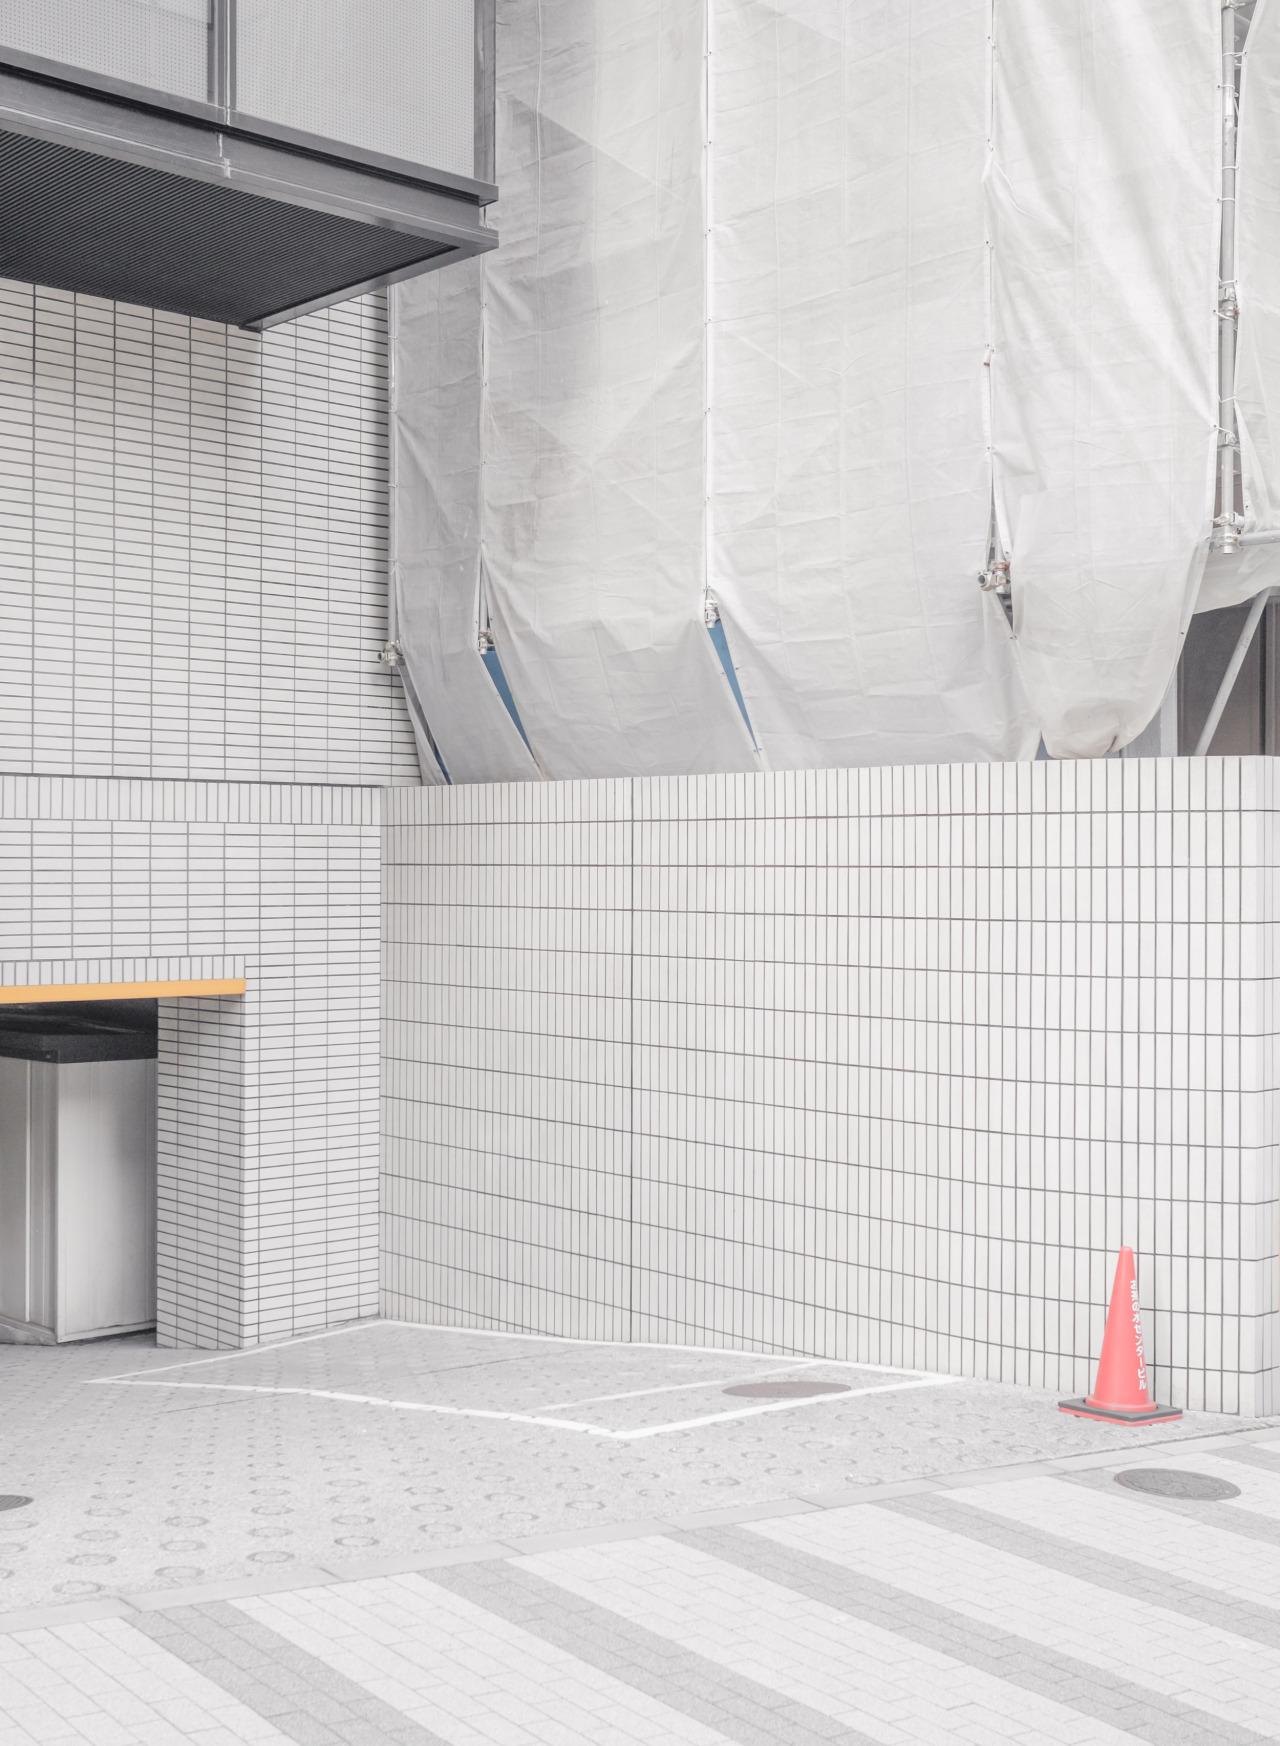 Tokyo's corners - A micro photo study